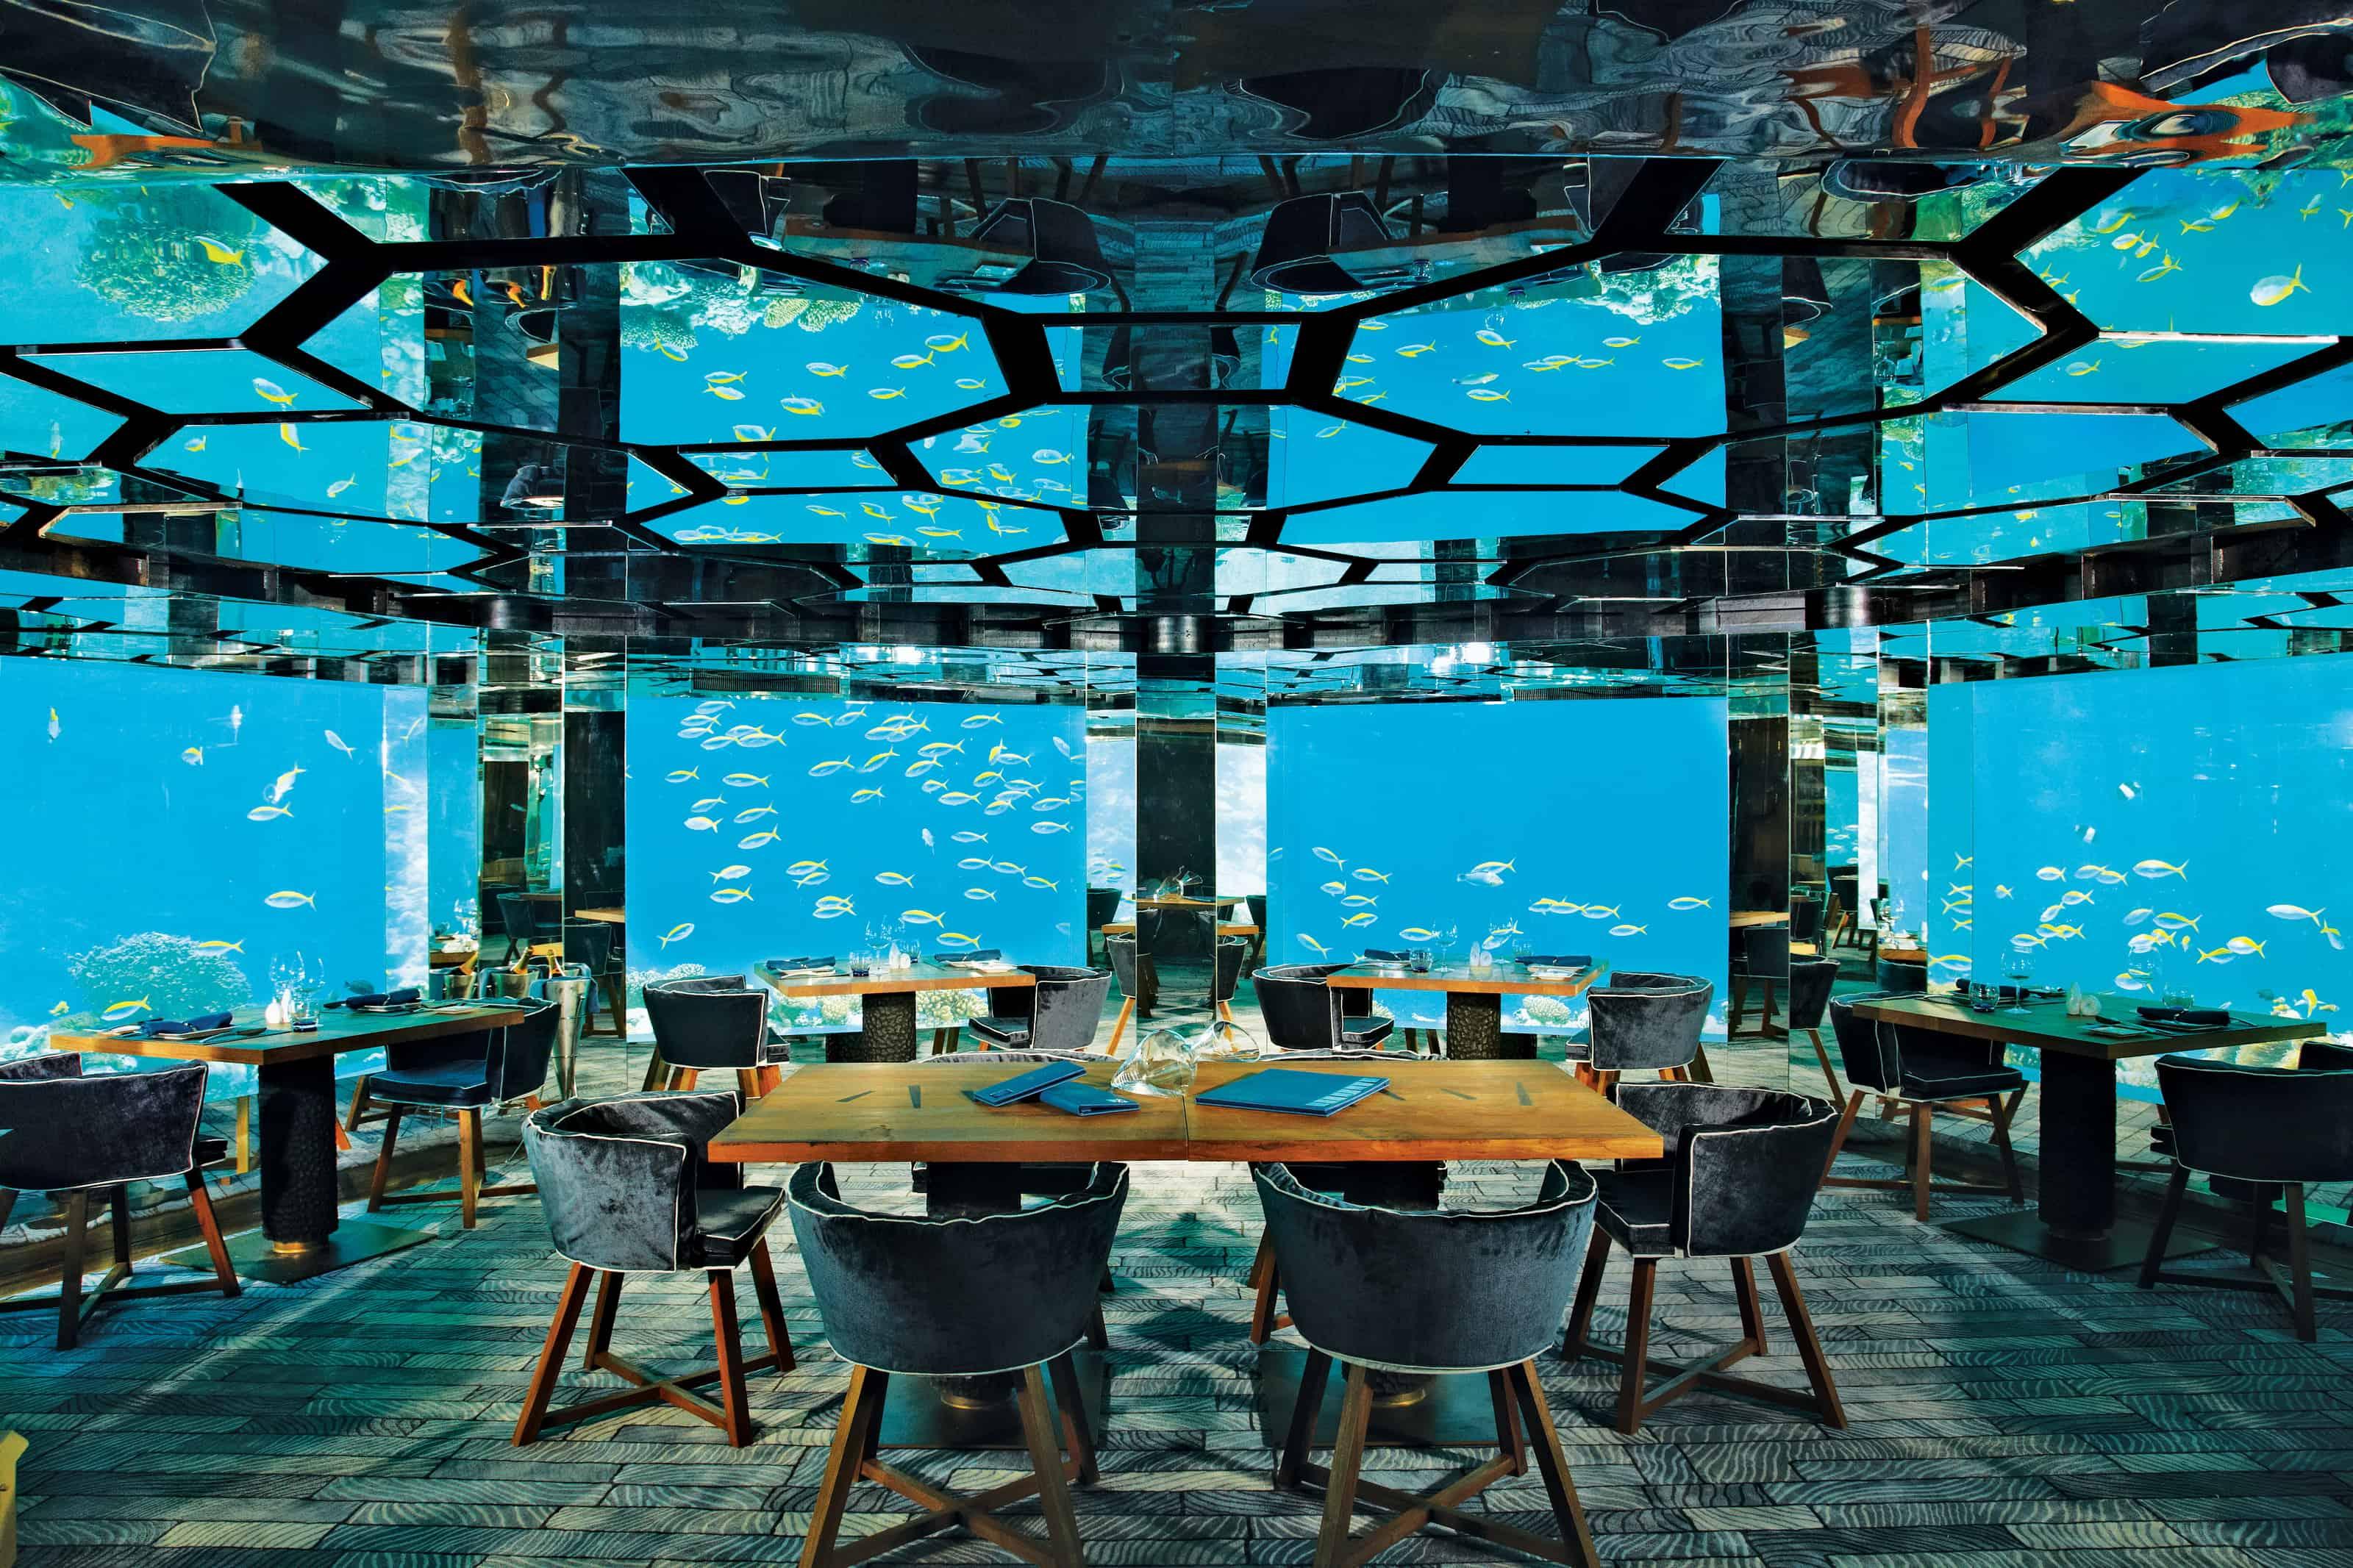 Anantara Kihavah Villas, Maldives – underwater hotel